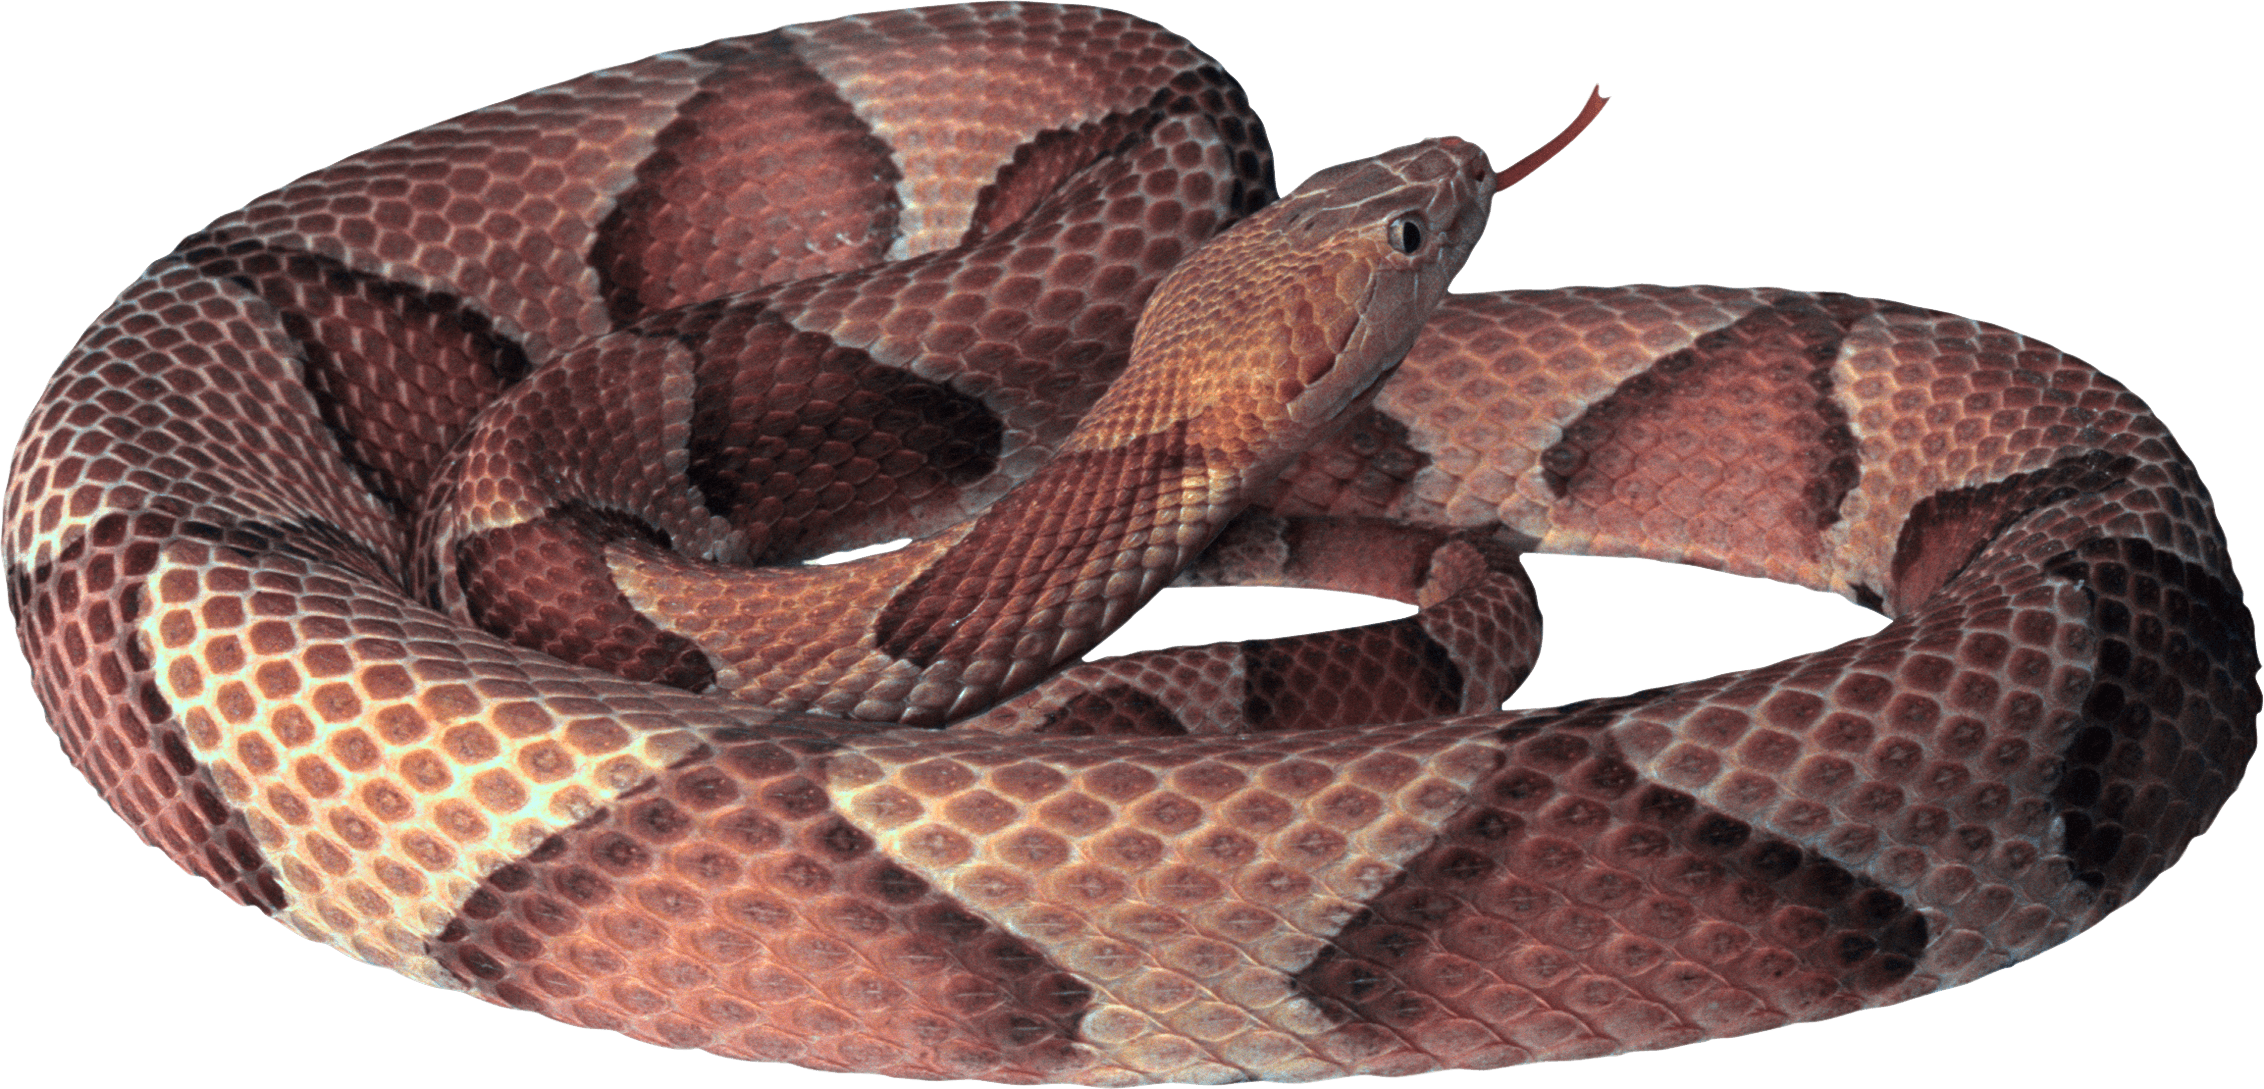 Snake clipart venomous snake. Curling png image purepng